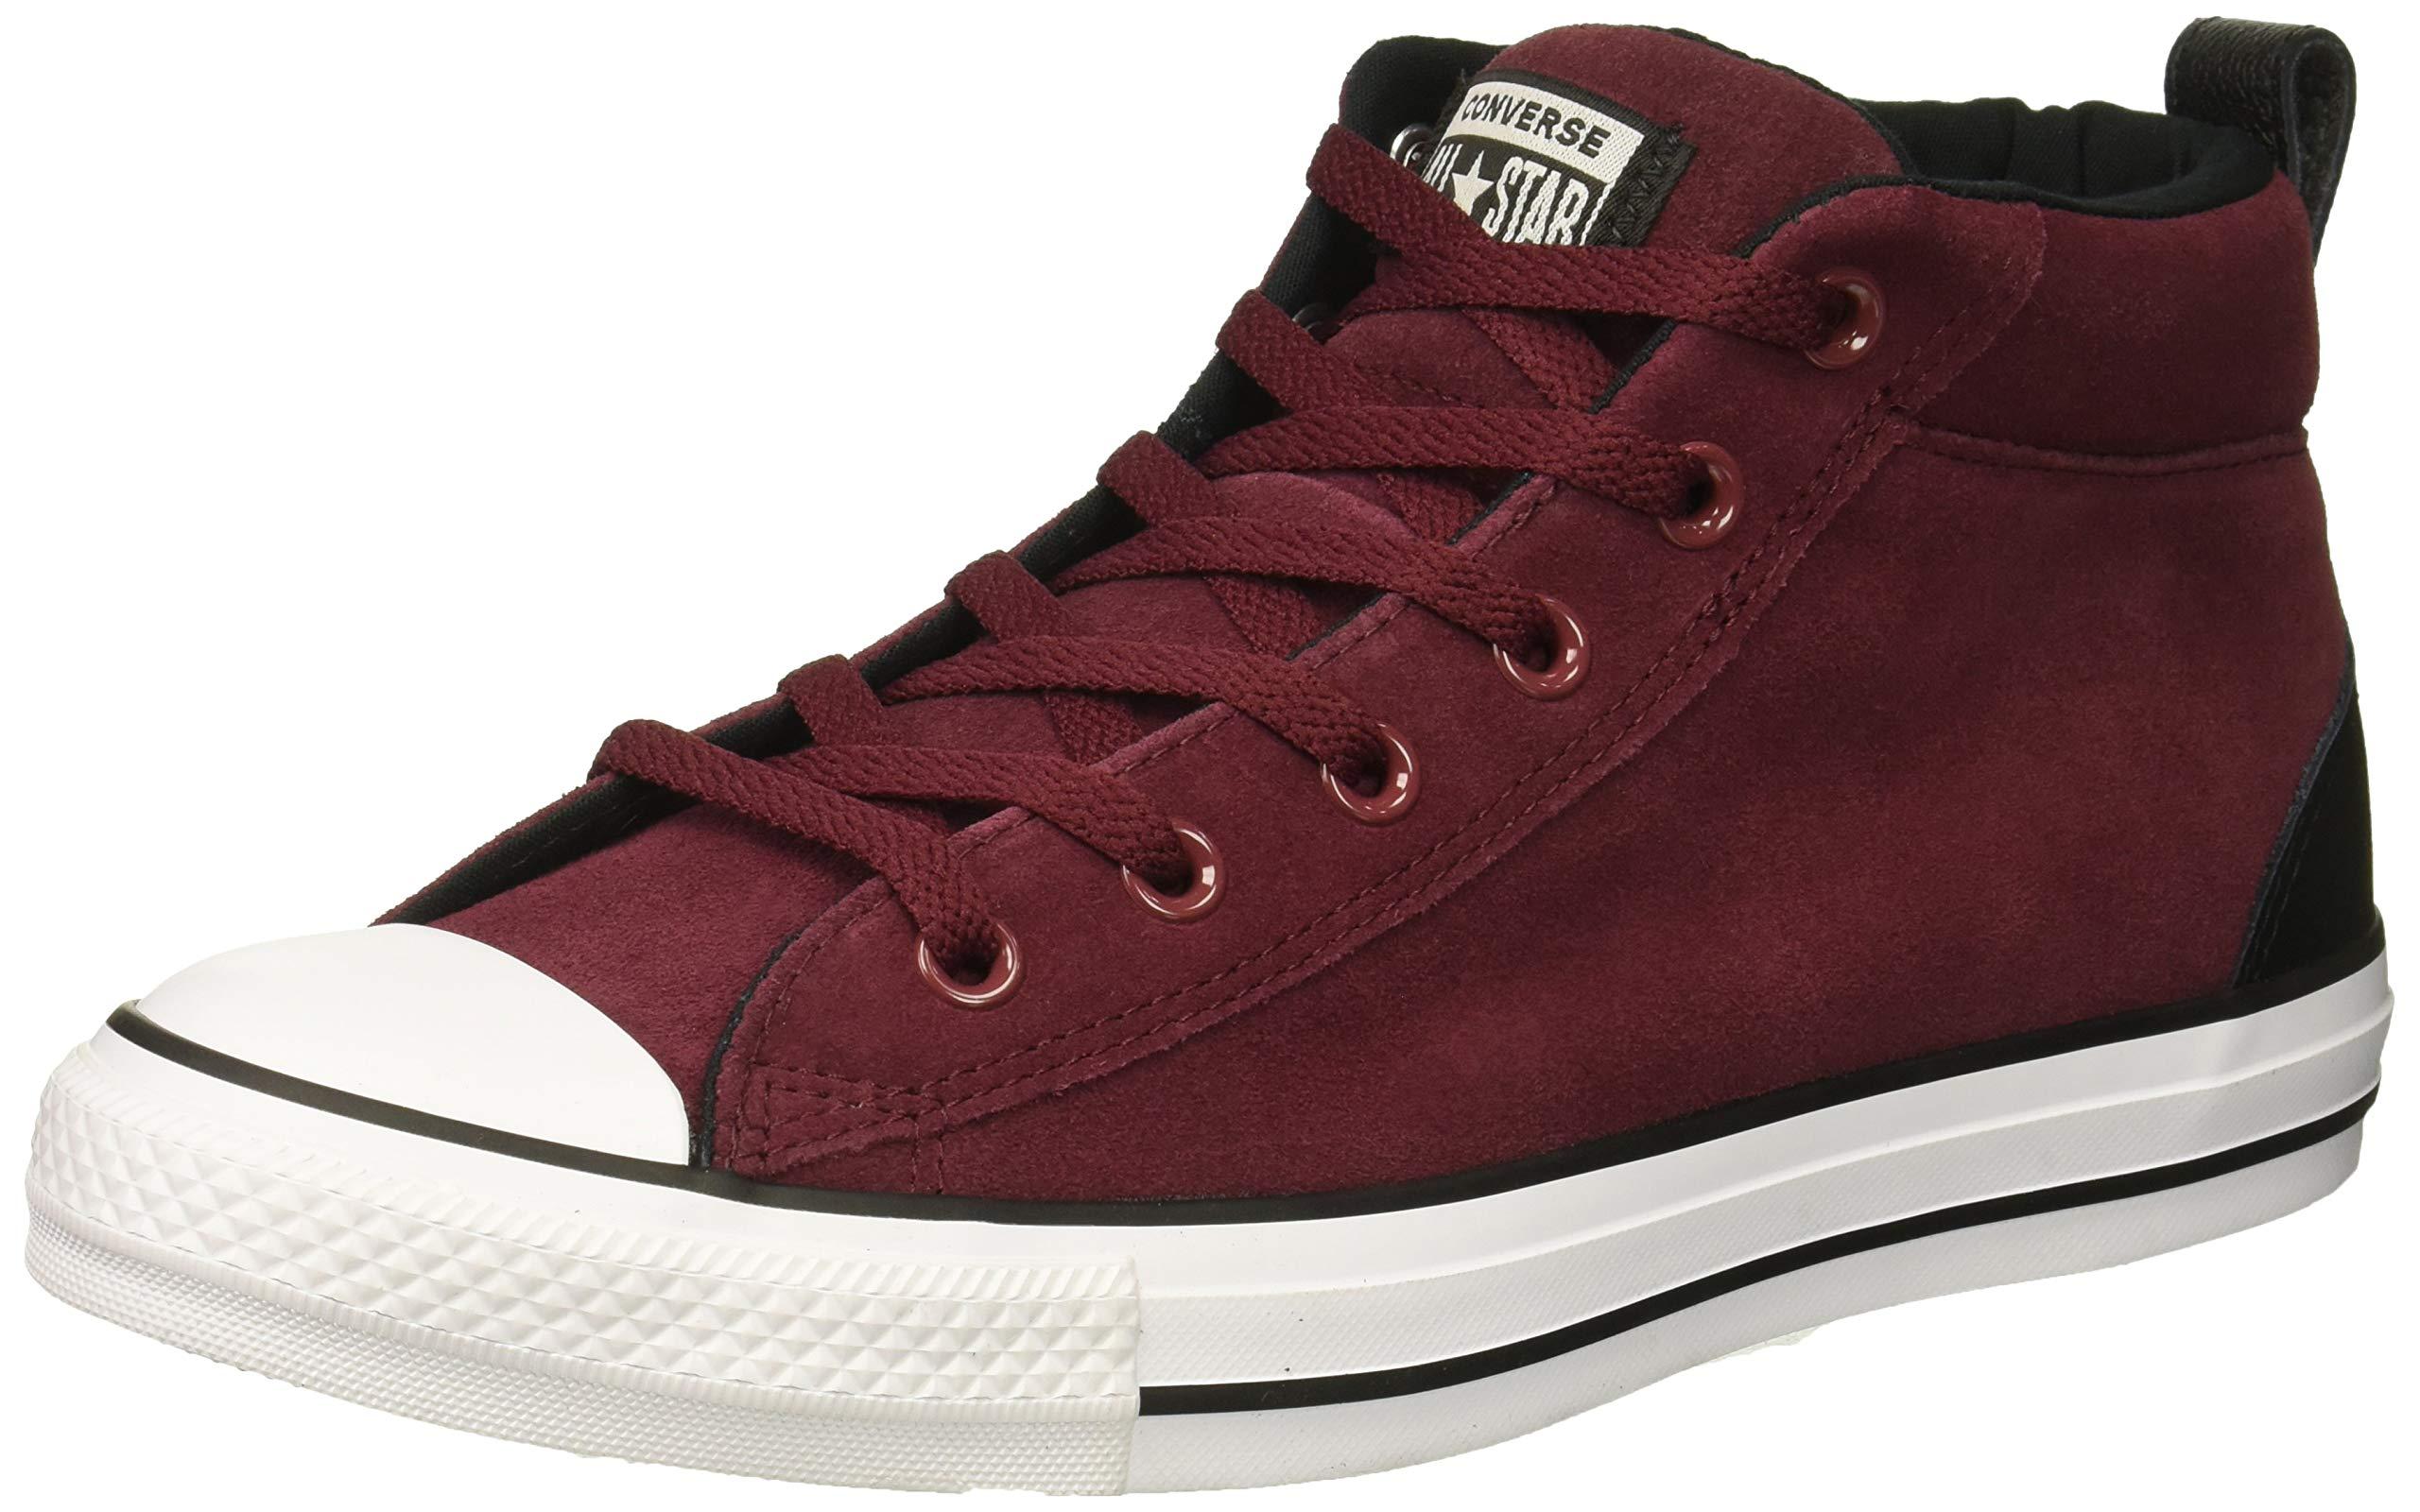 Converse Chuck Taylor All Star Street Suede Mid Sneaker, Dark Burgundy/Black/White, 11 M US